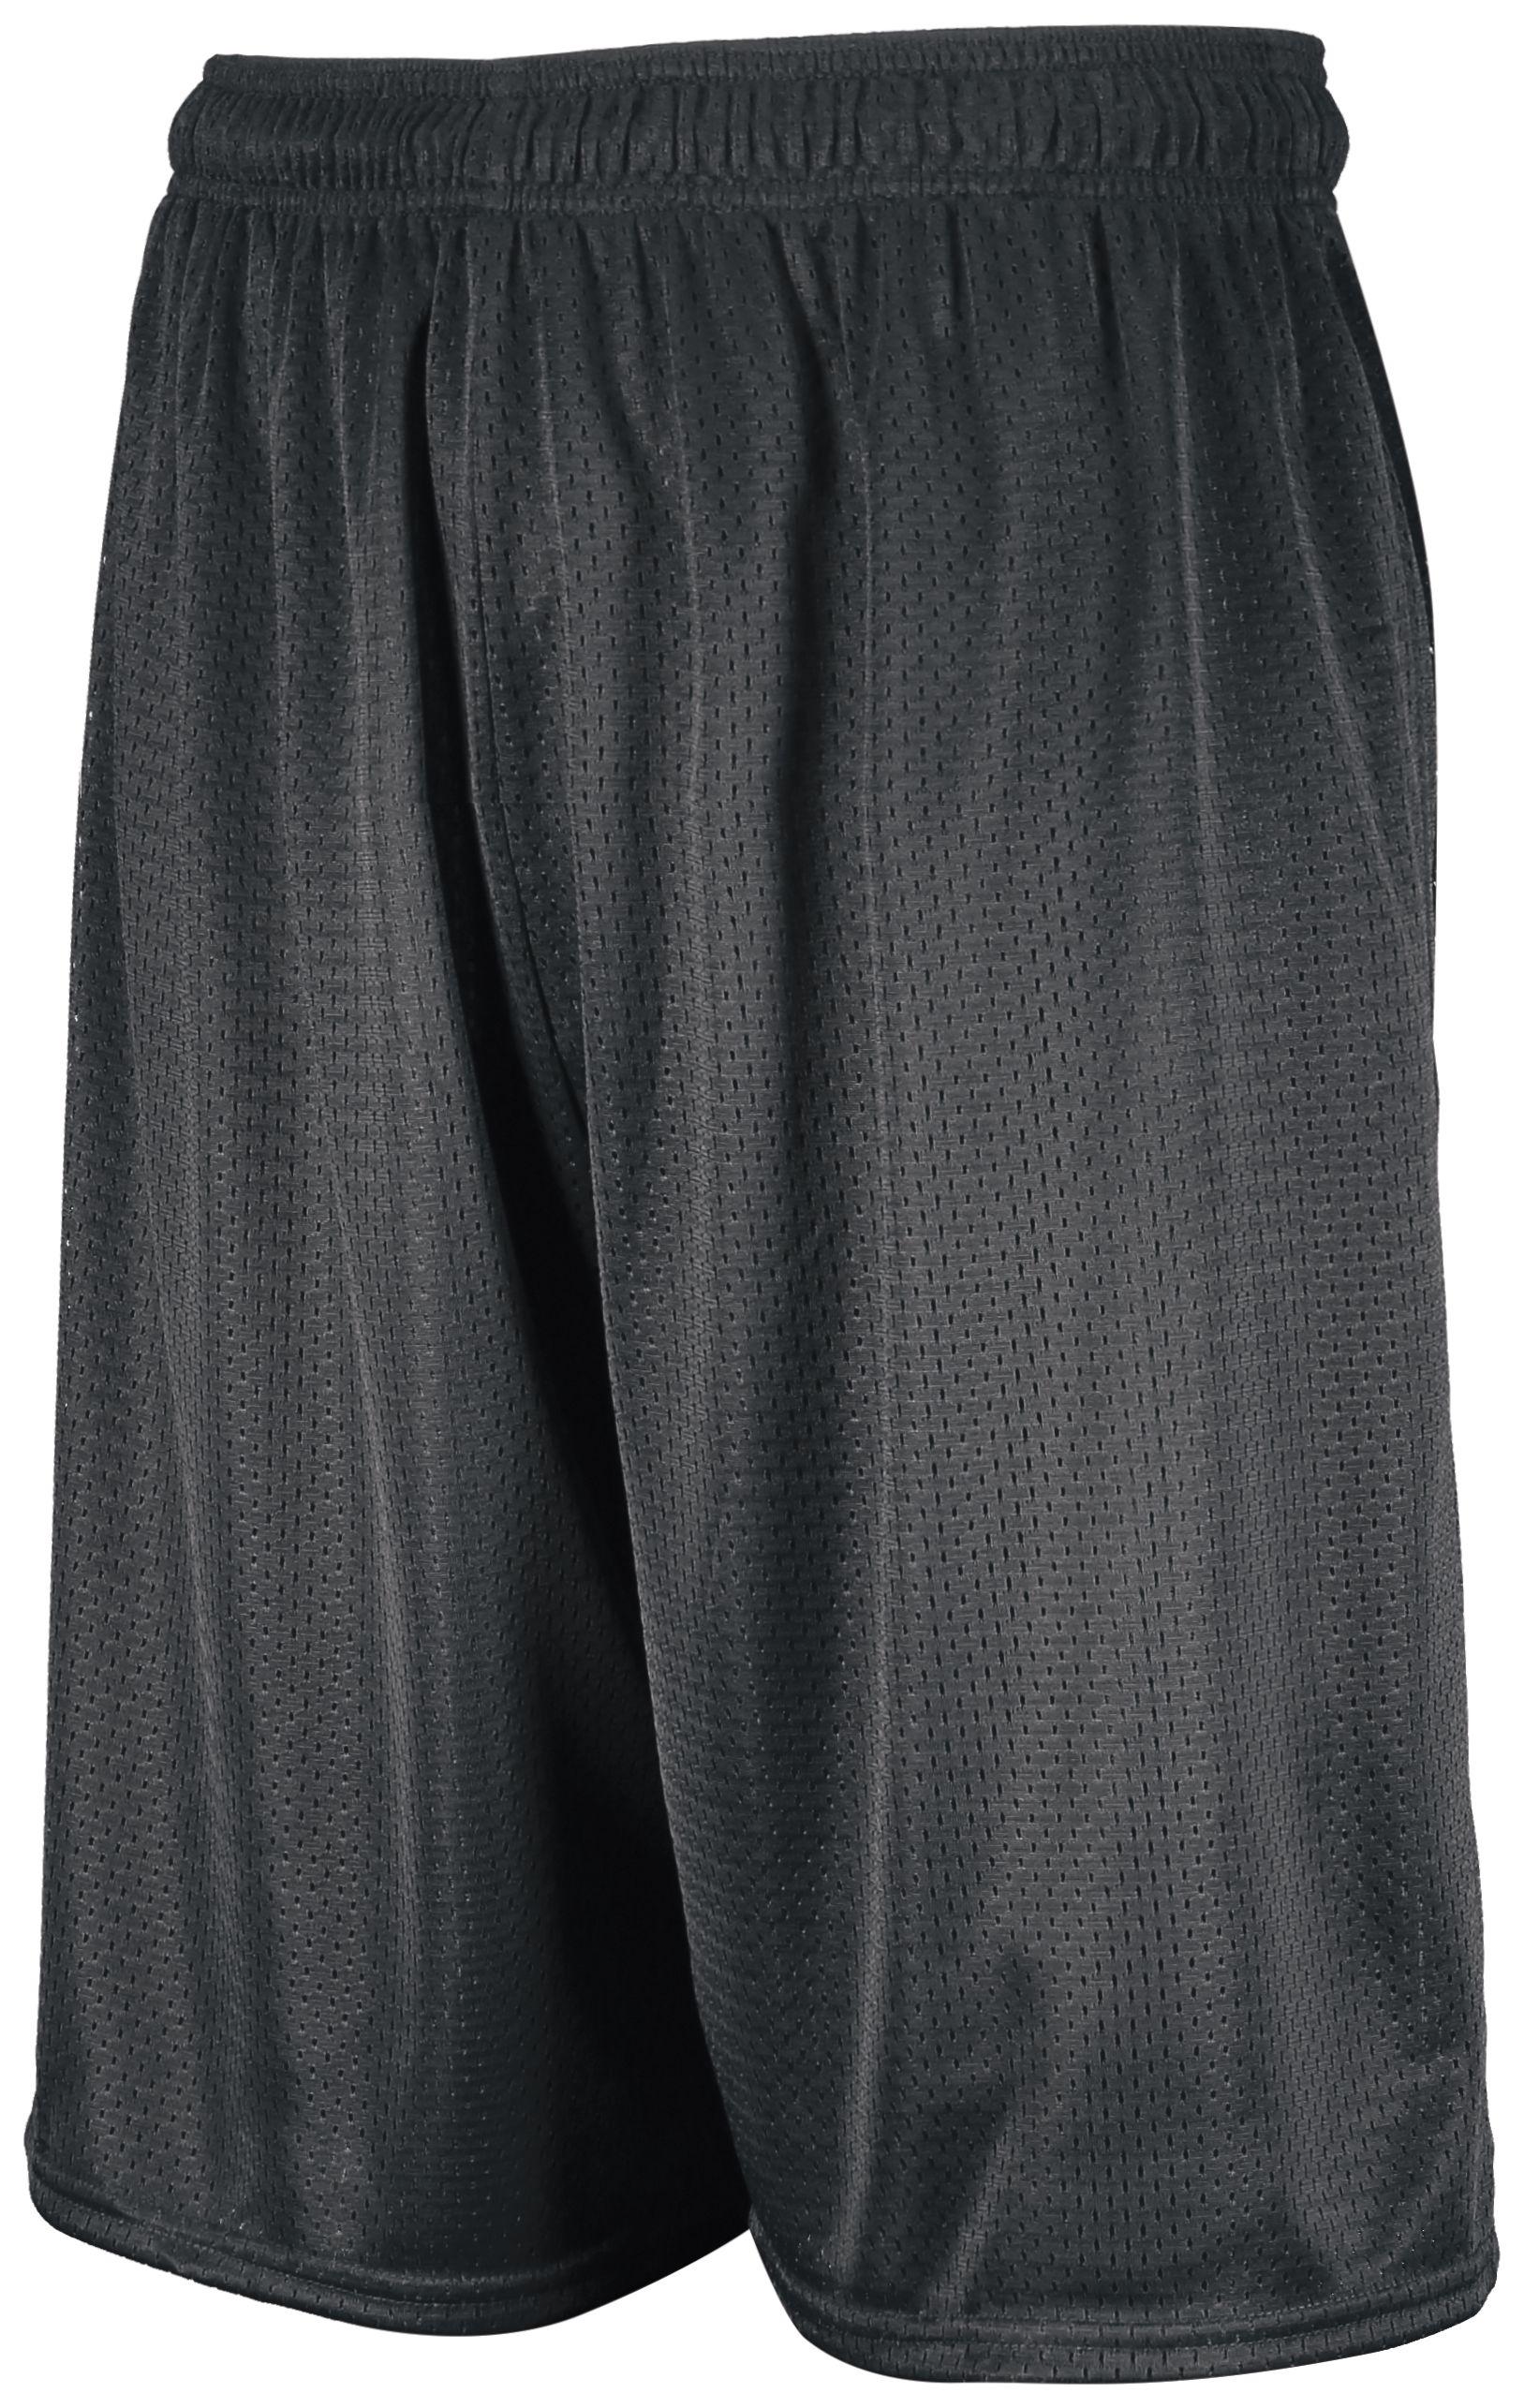 Dri-Power Mesh Shorts - Black